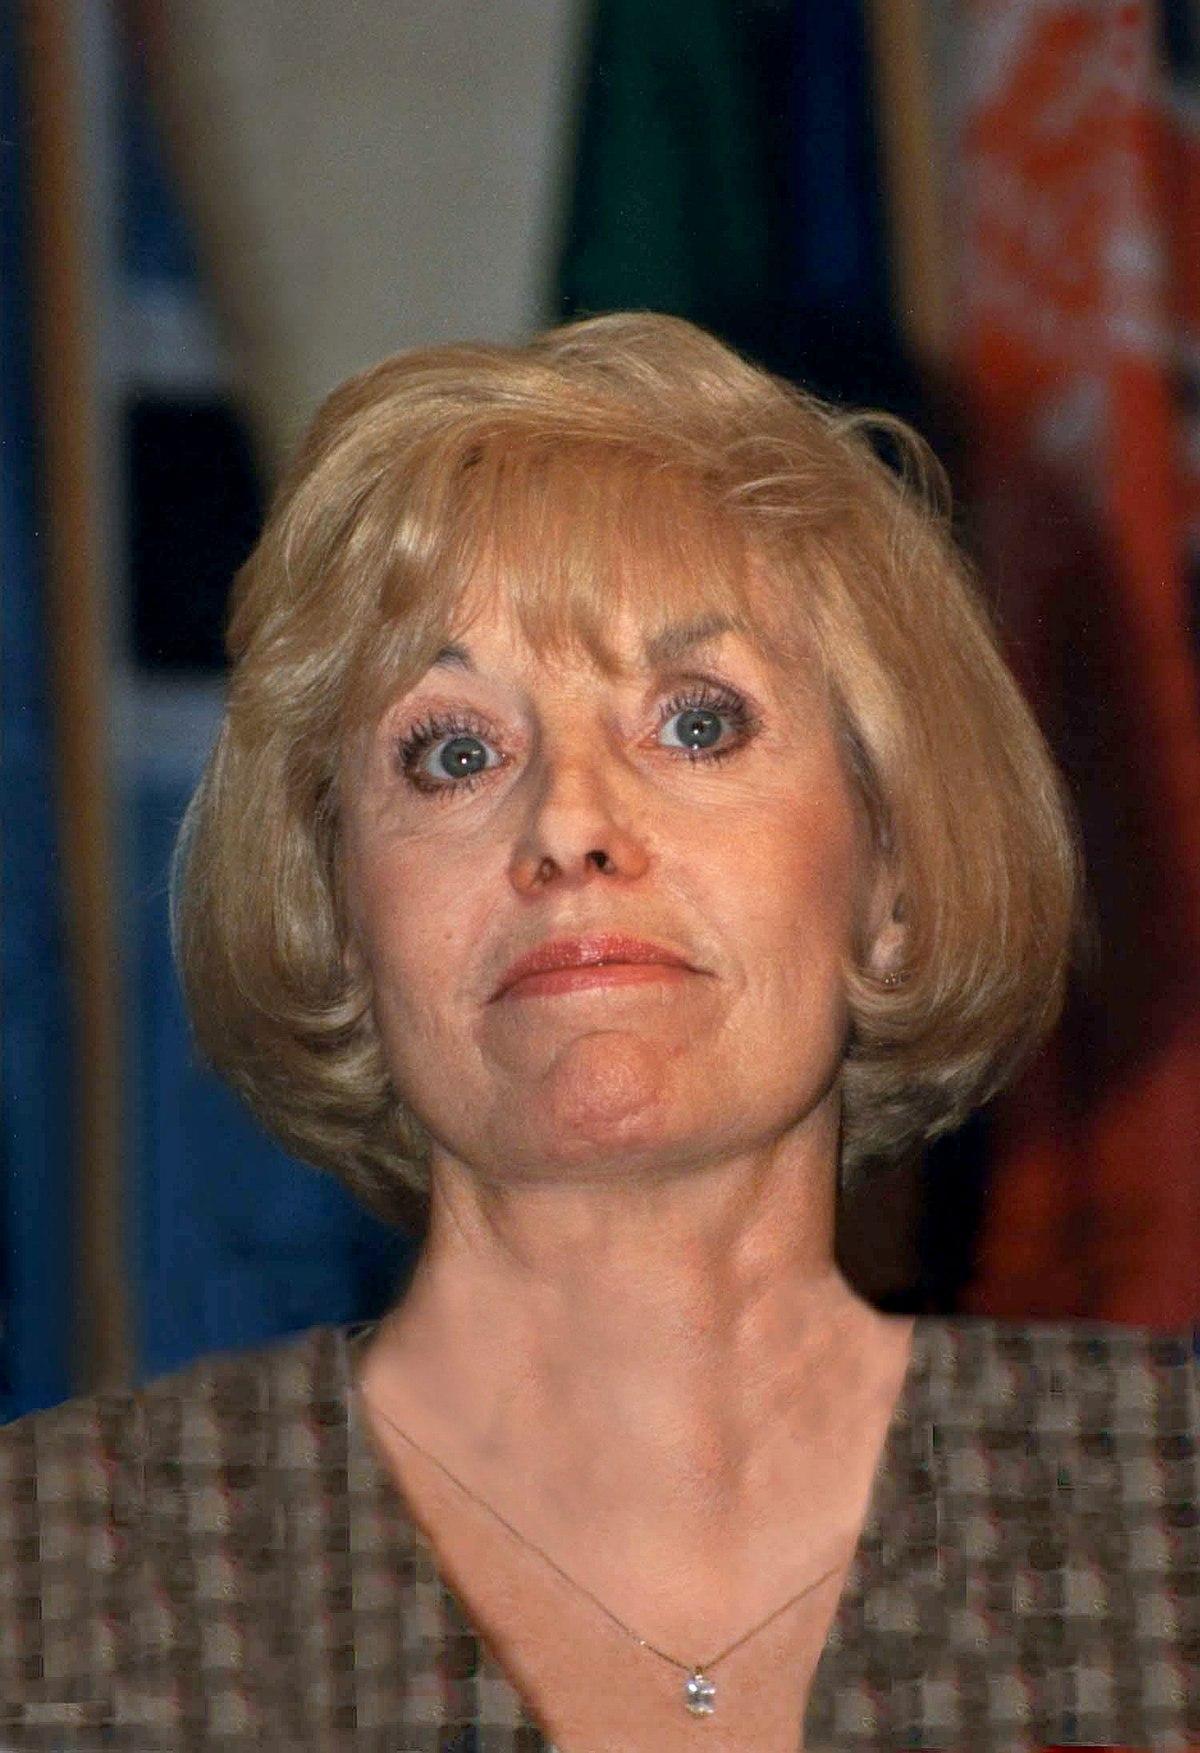 South Eastern University >> Betty Williams (Nobel laureate) - Wikipedia